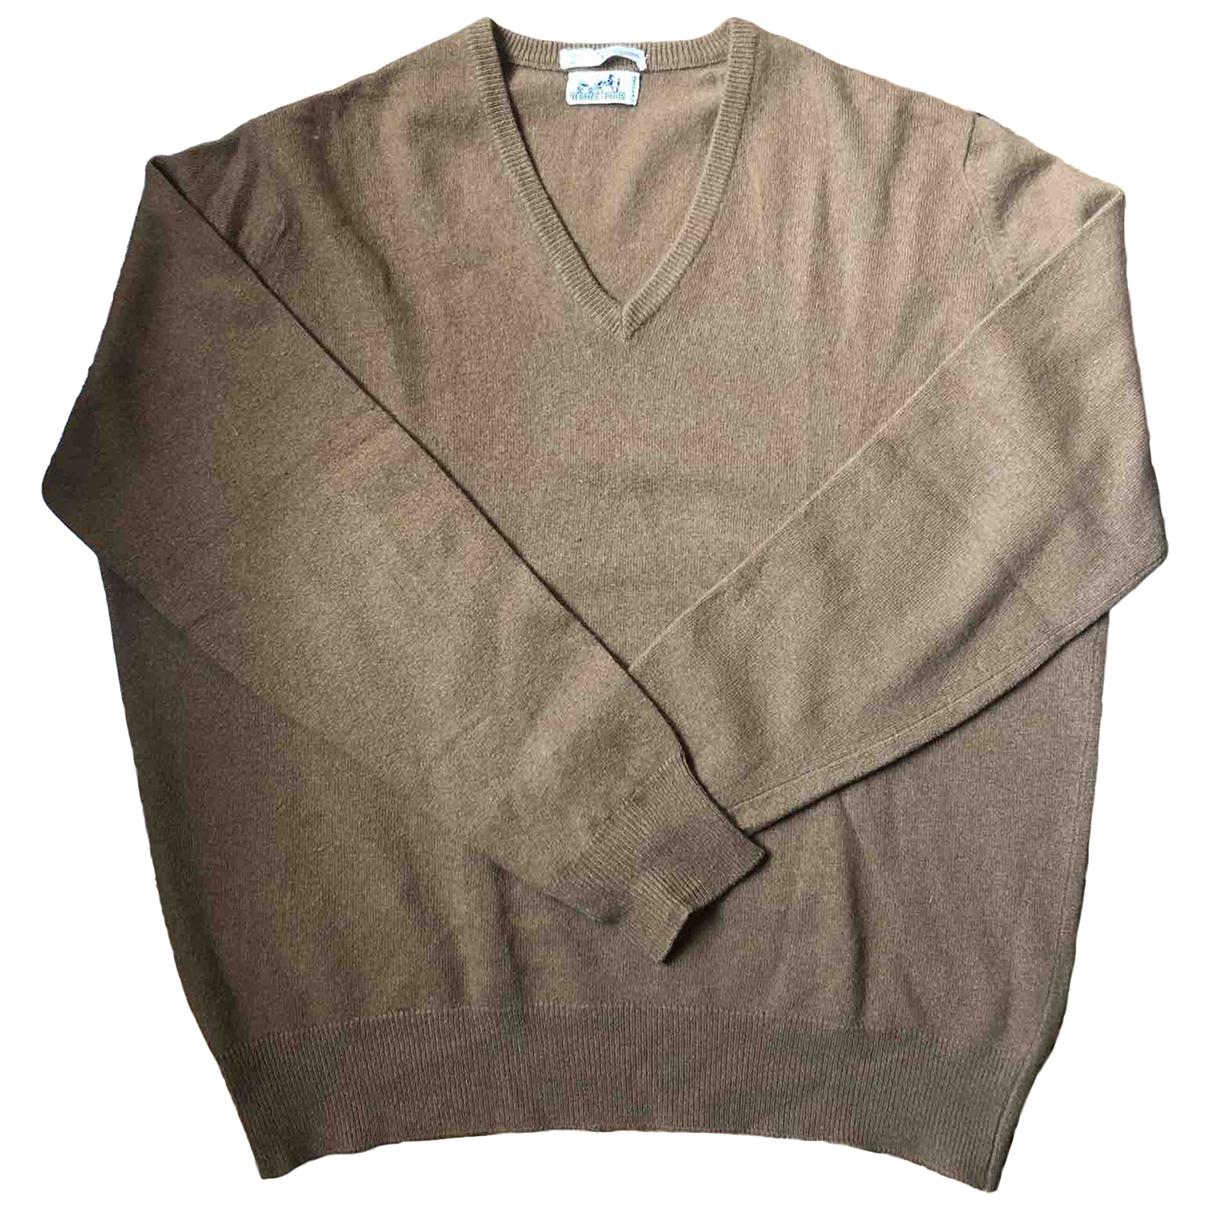 Hermès N Camel Cashmere Knitwear for Women L International